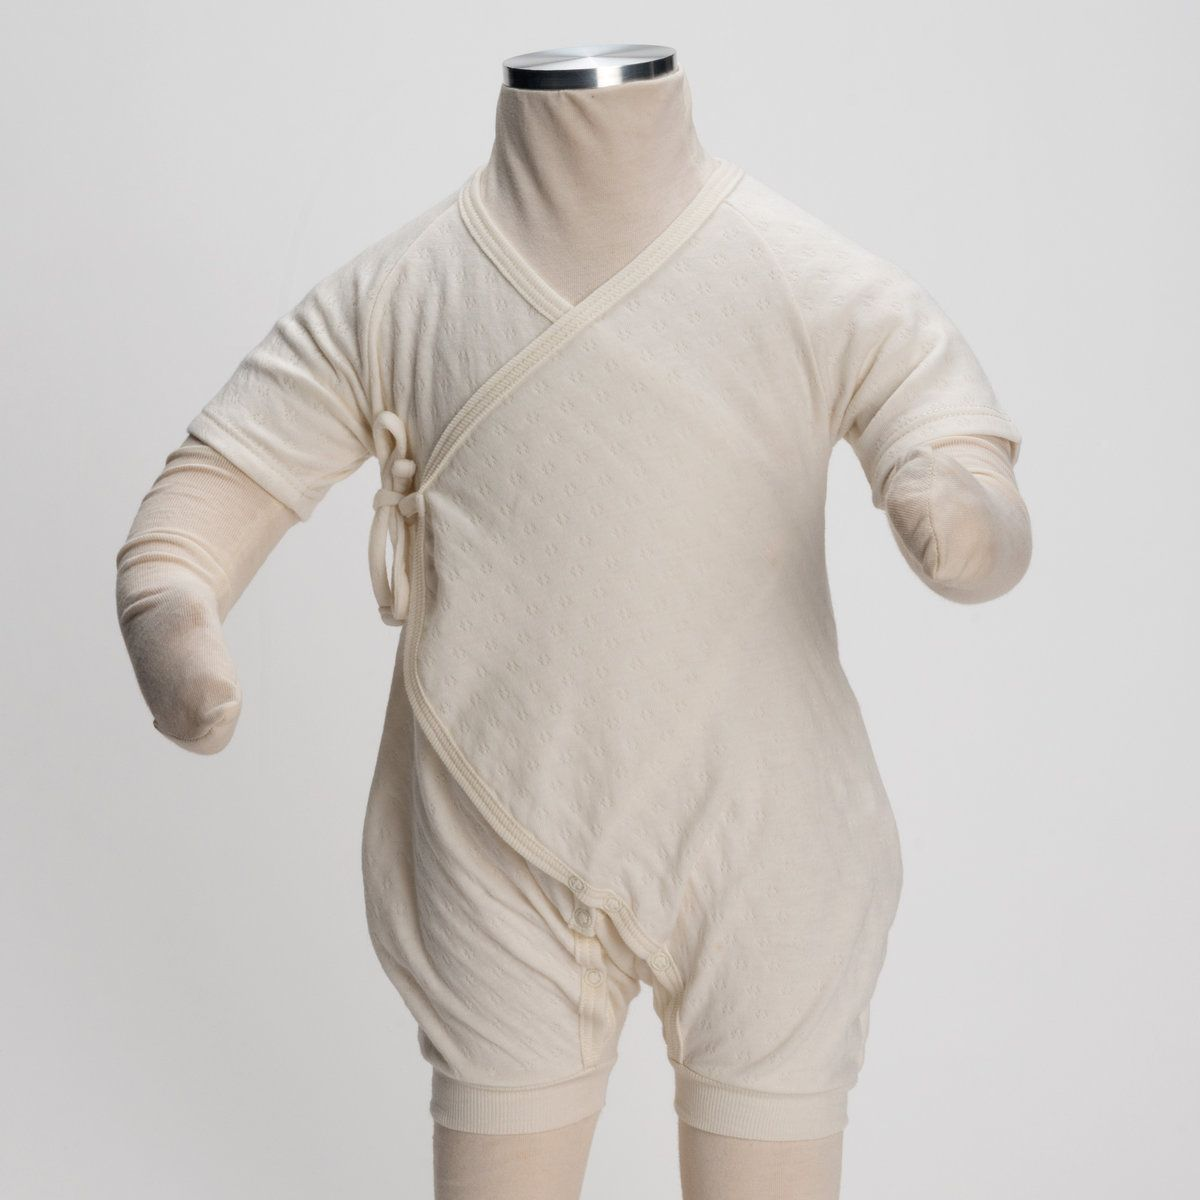 6-9 Months Luxurious Organic Infant and Baby Clothing: onesies : S/slv Kimono Onesie w/ Leggings